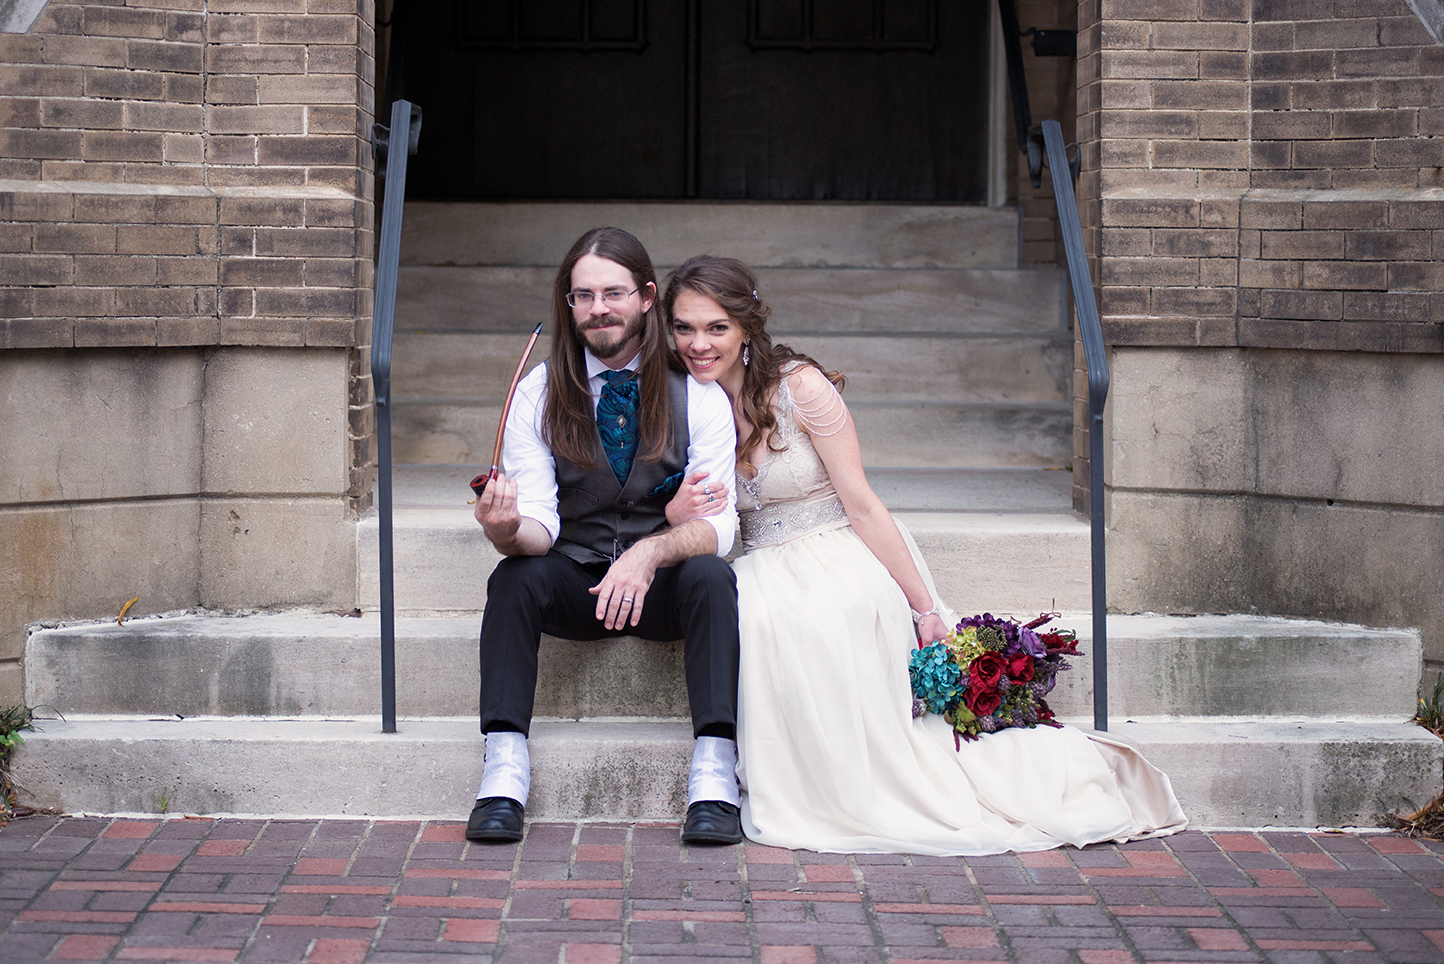 Wedding photo remake